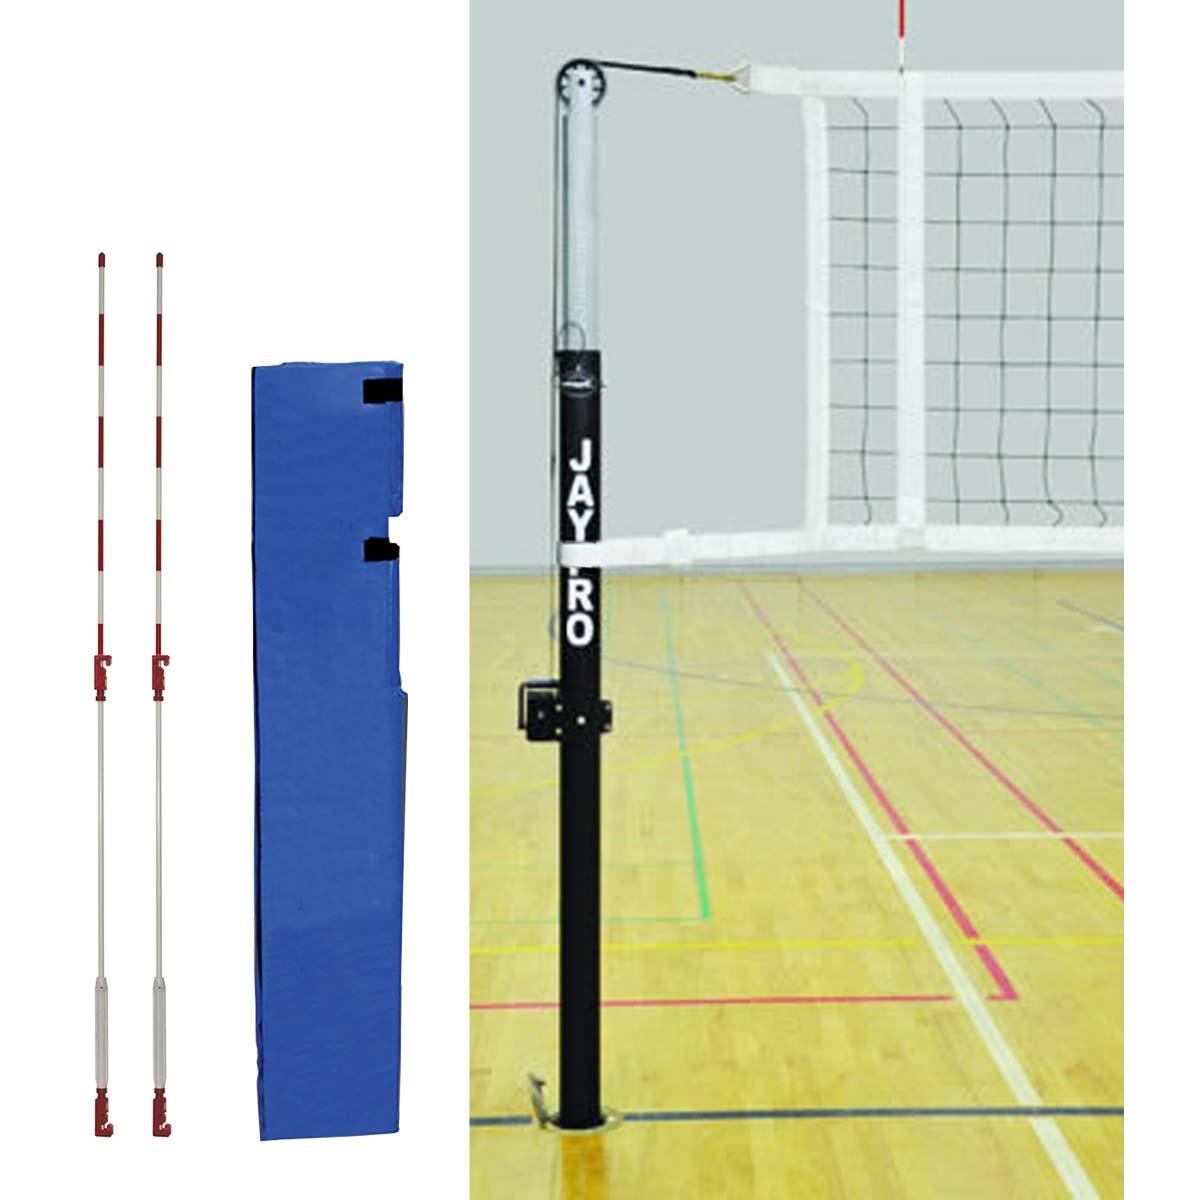 Jaypro Featherlite 3 1 2 Competition Volleyball Net System Pvb 5000 A25 108 Anthem Sports